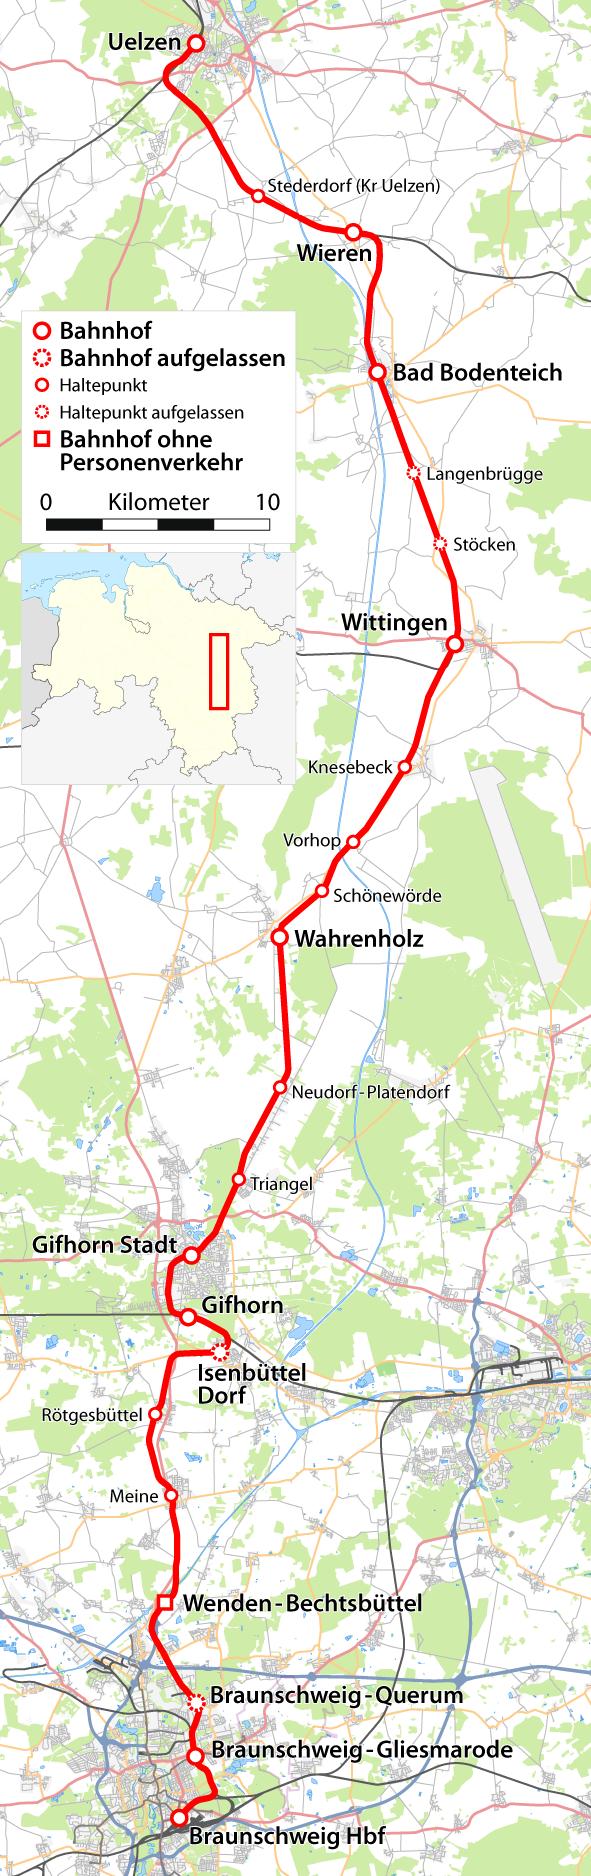 FileKarte der Bahnstrecke Uelzen Braunschweigpng Wikimedia Commons